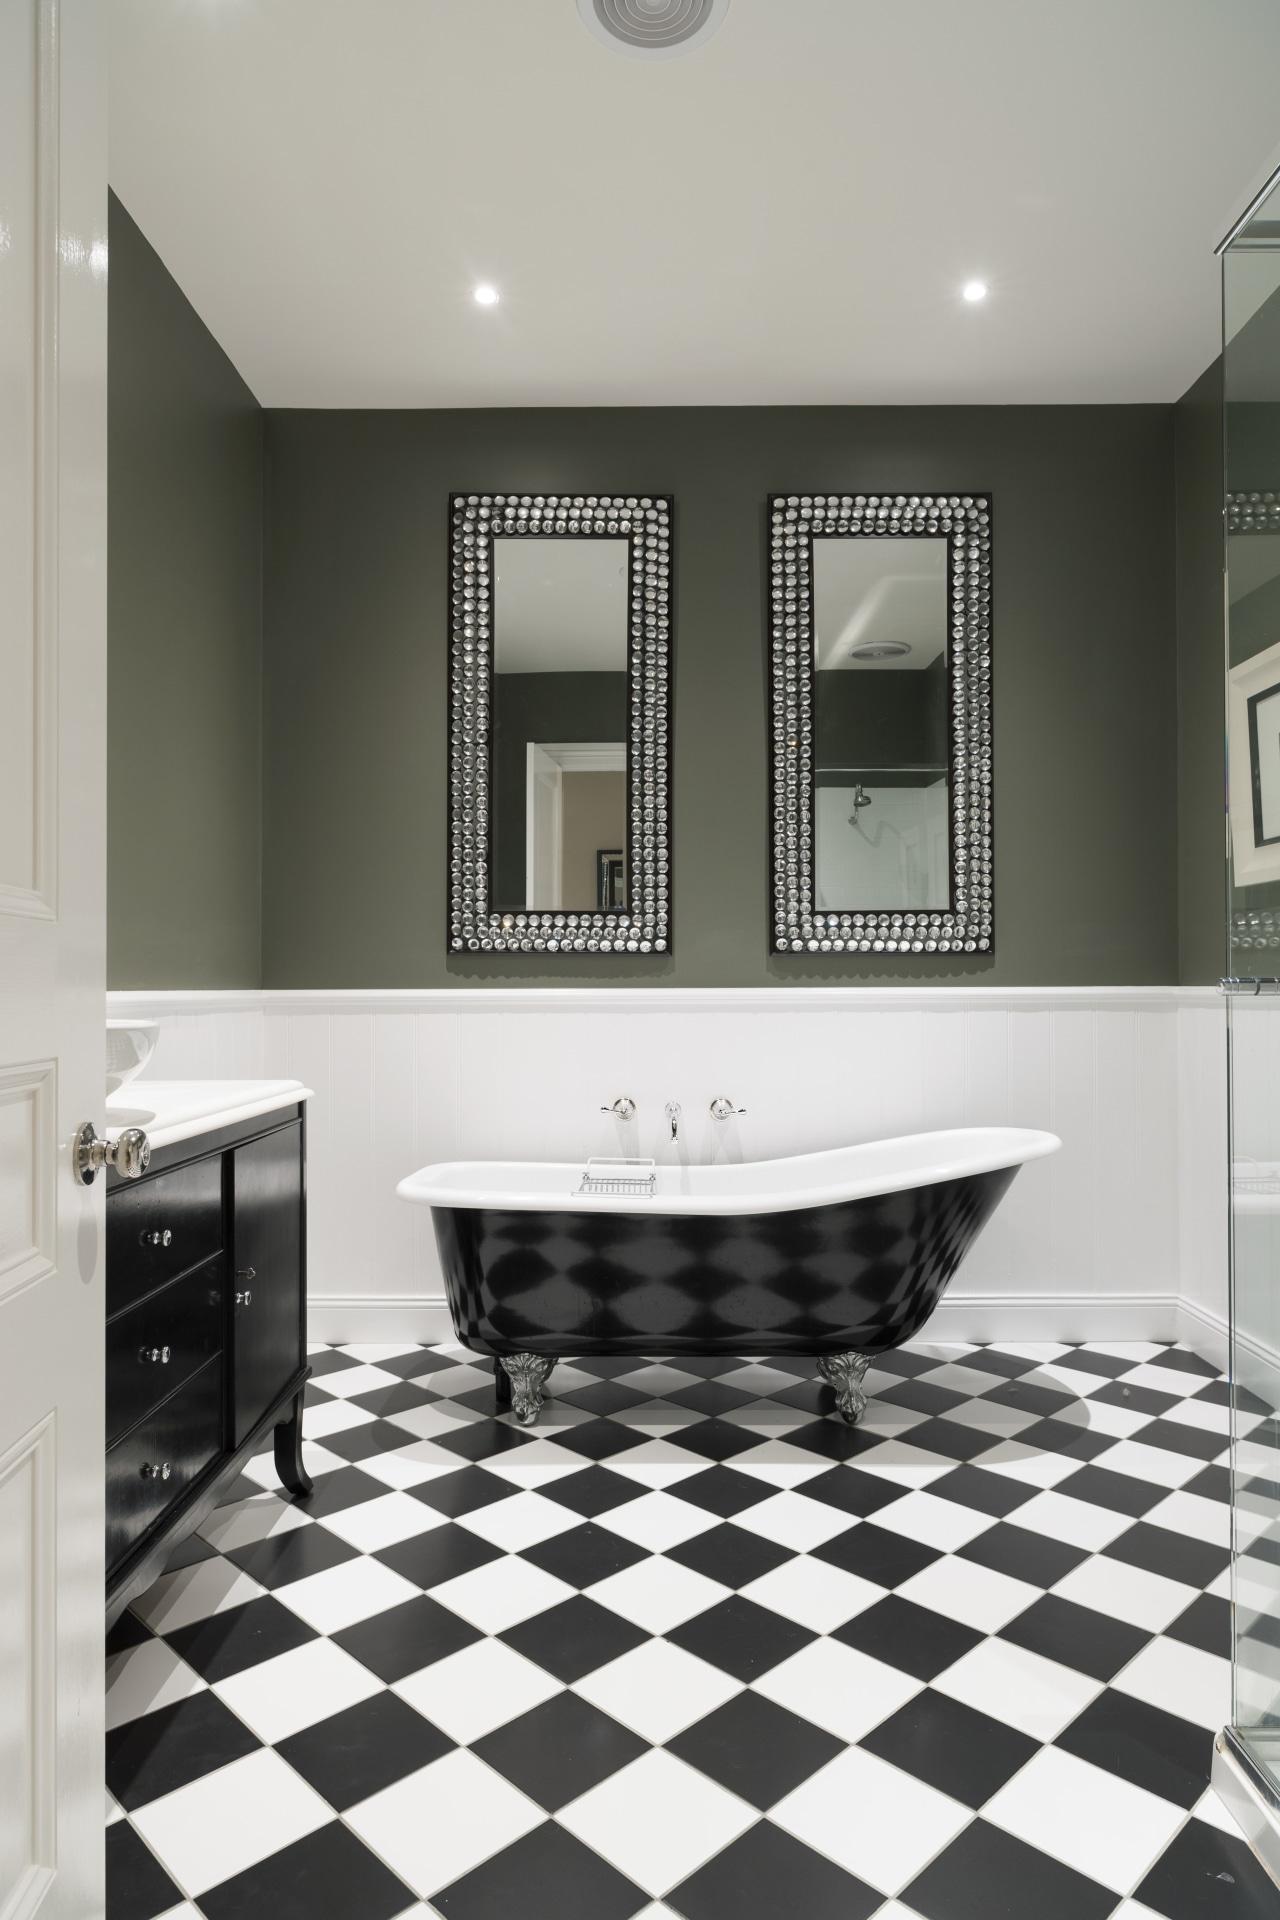 Transitional bathroom bathroom, countertop, floor, flooring, home, interior design, room, sink, tile, white, black